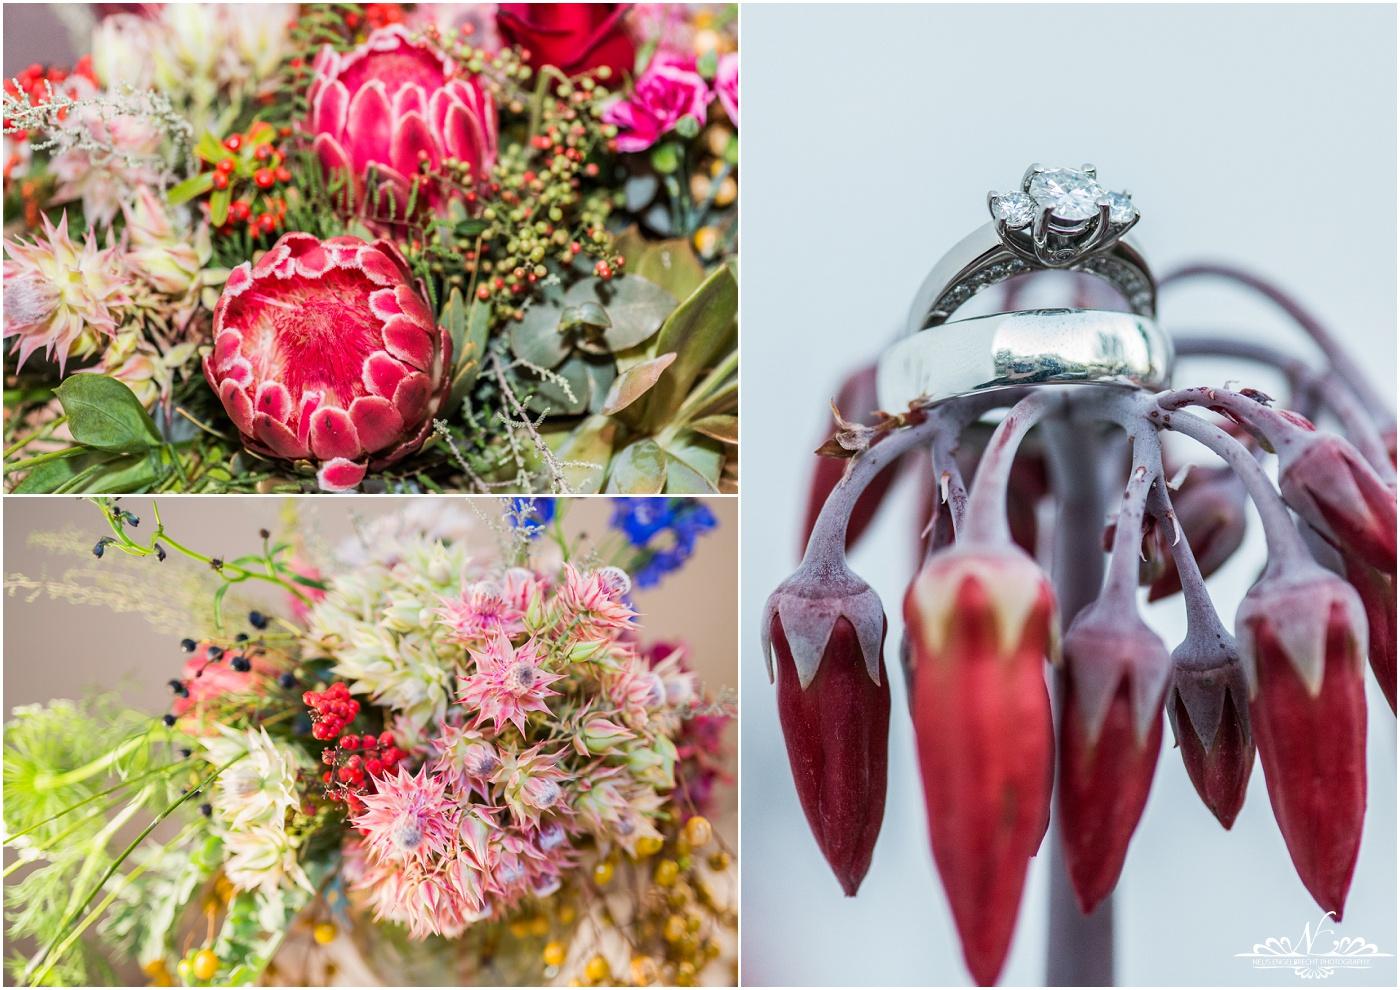 Langkloof-Roses-Wedding-Photos-Nelis-Engelbrecht-Photography-002